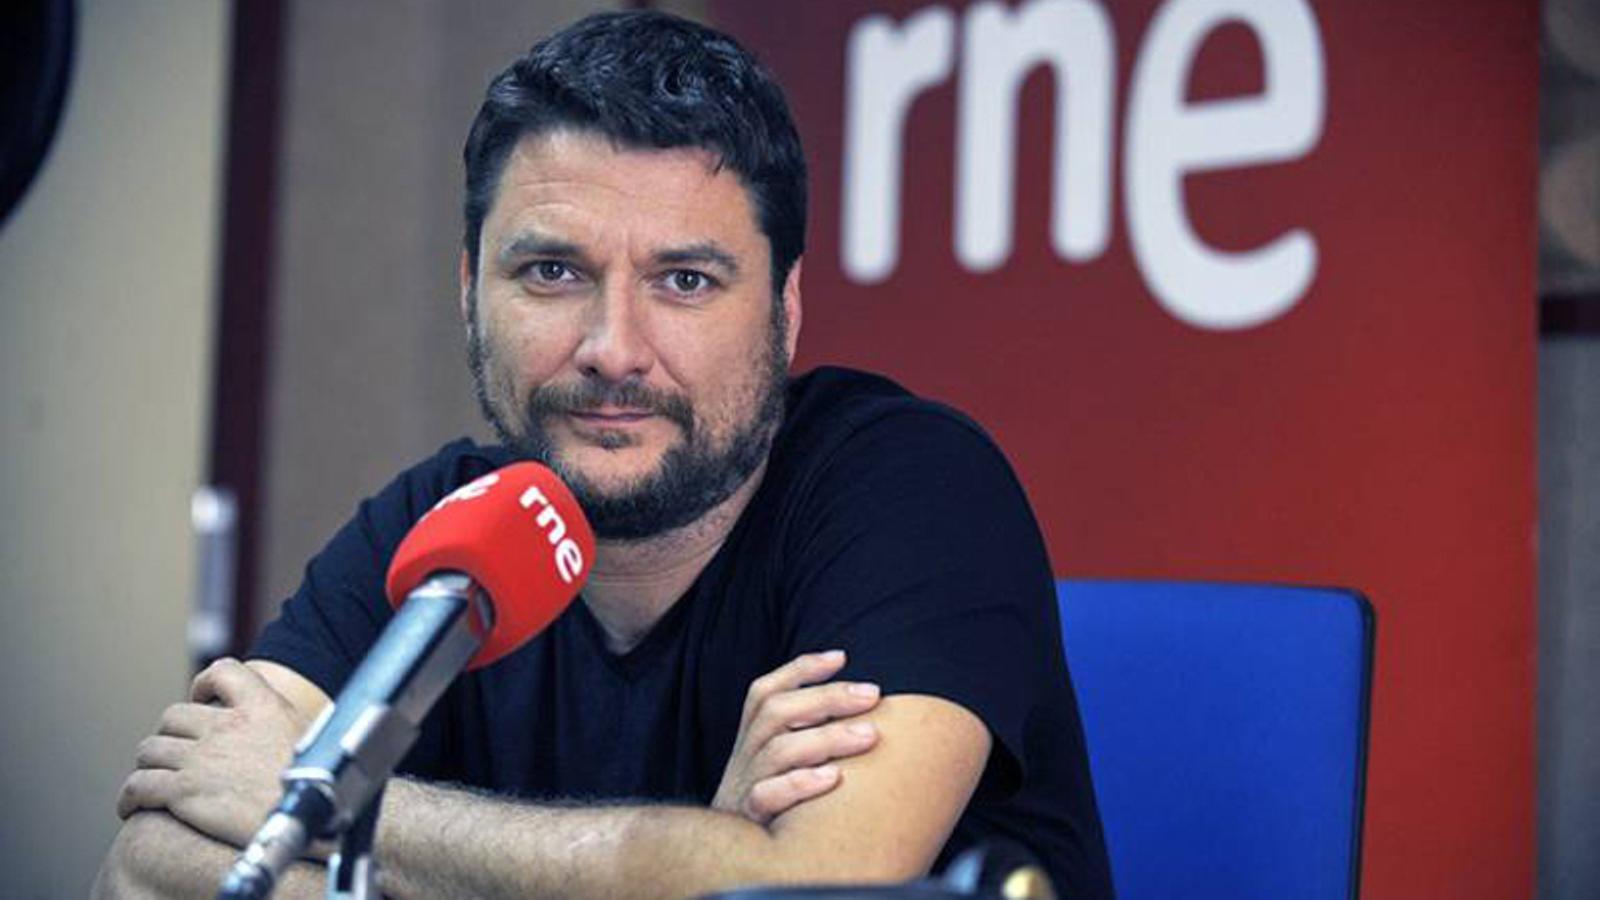 Ignacio Marimón